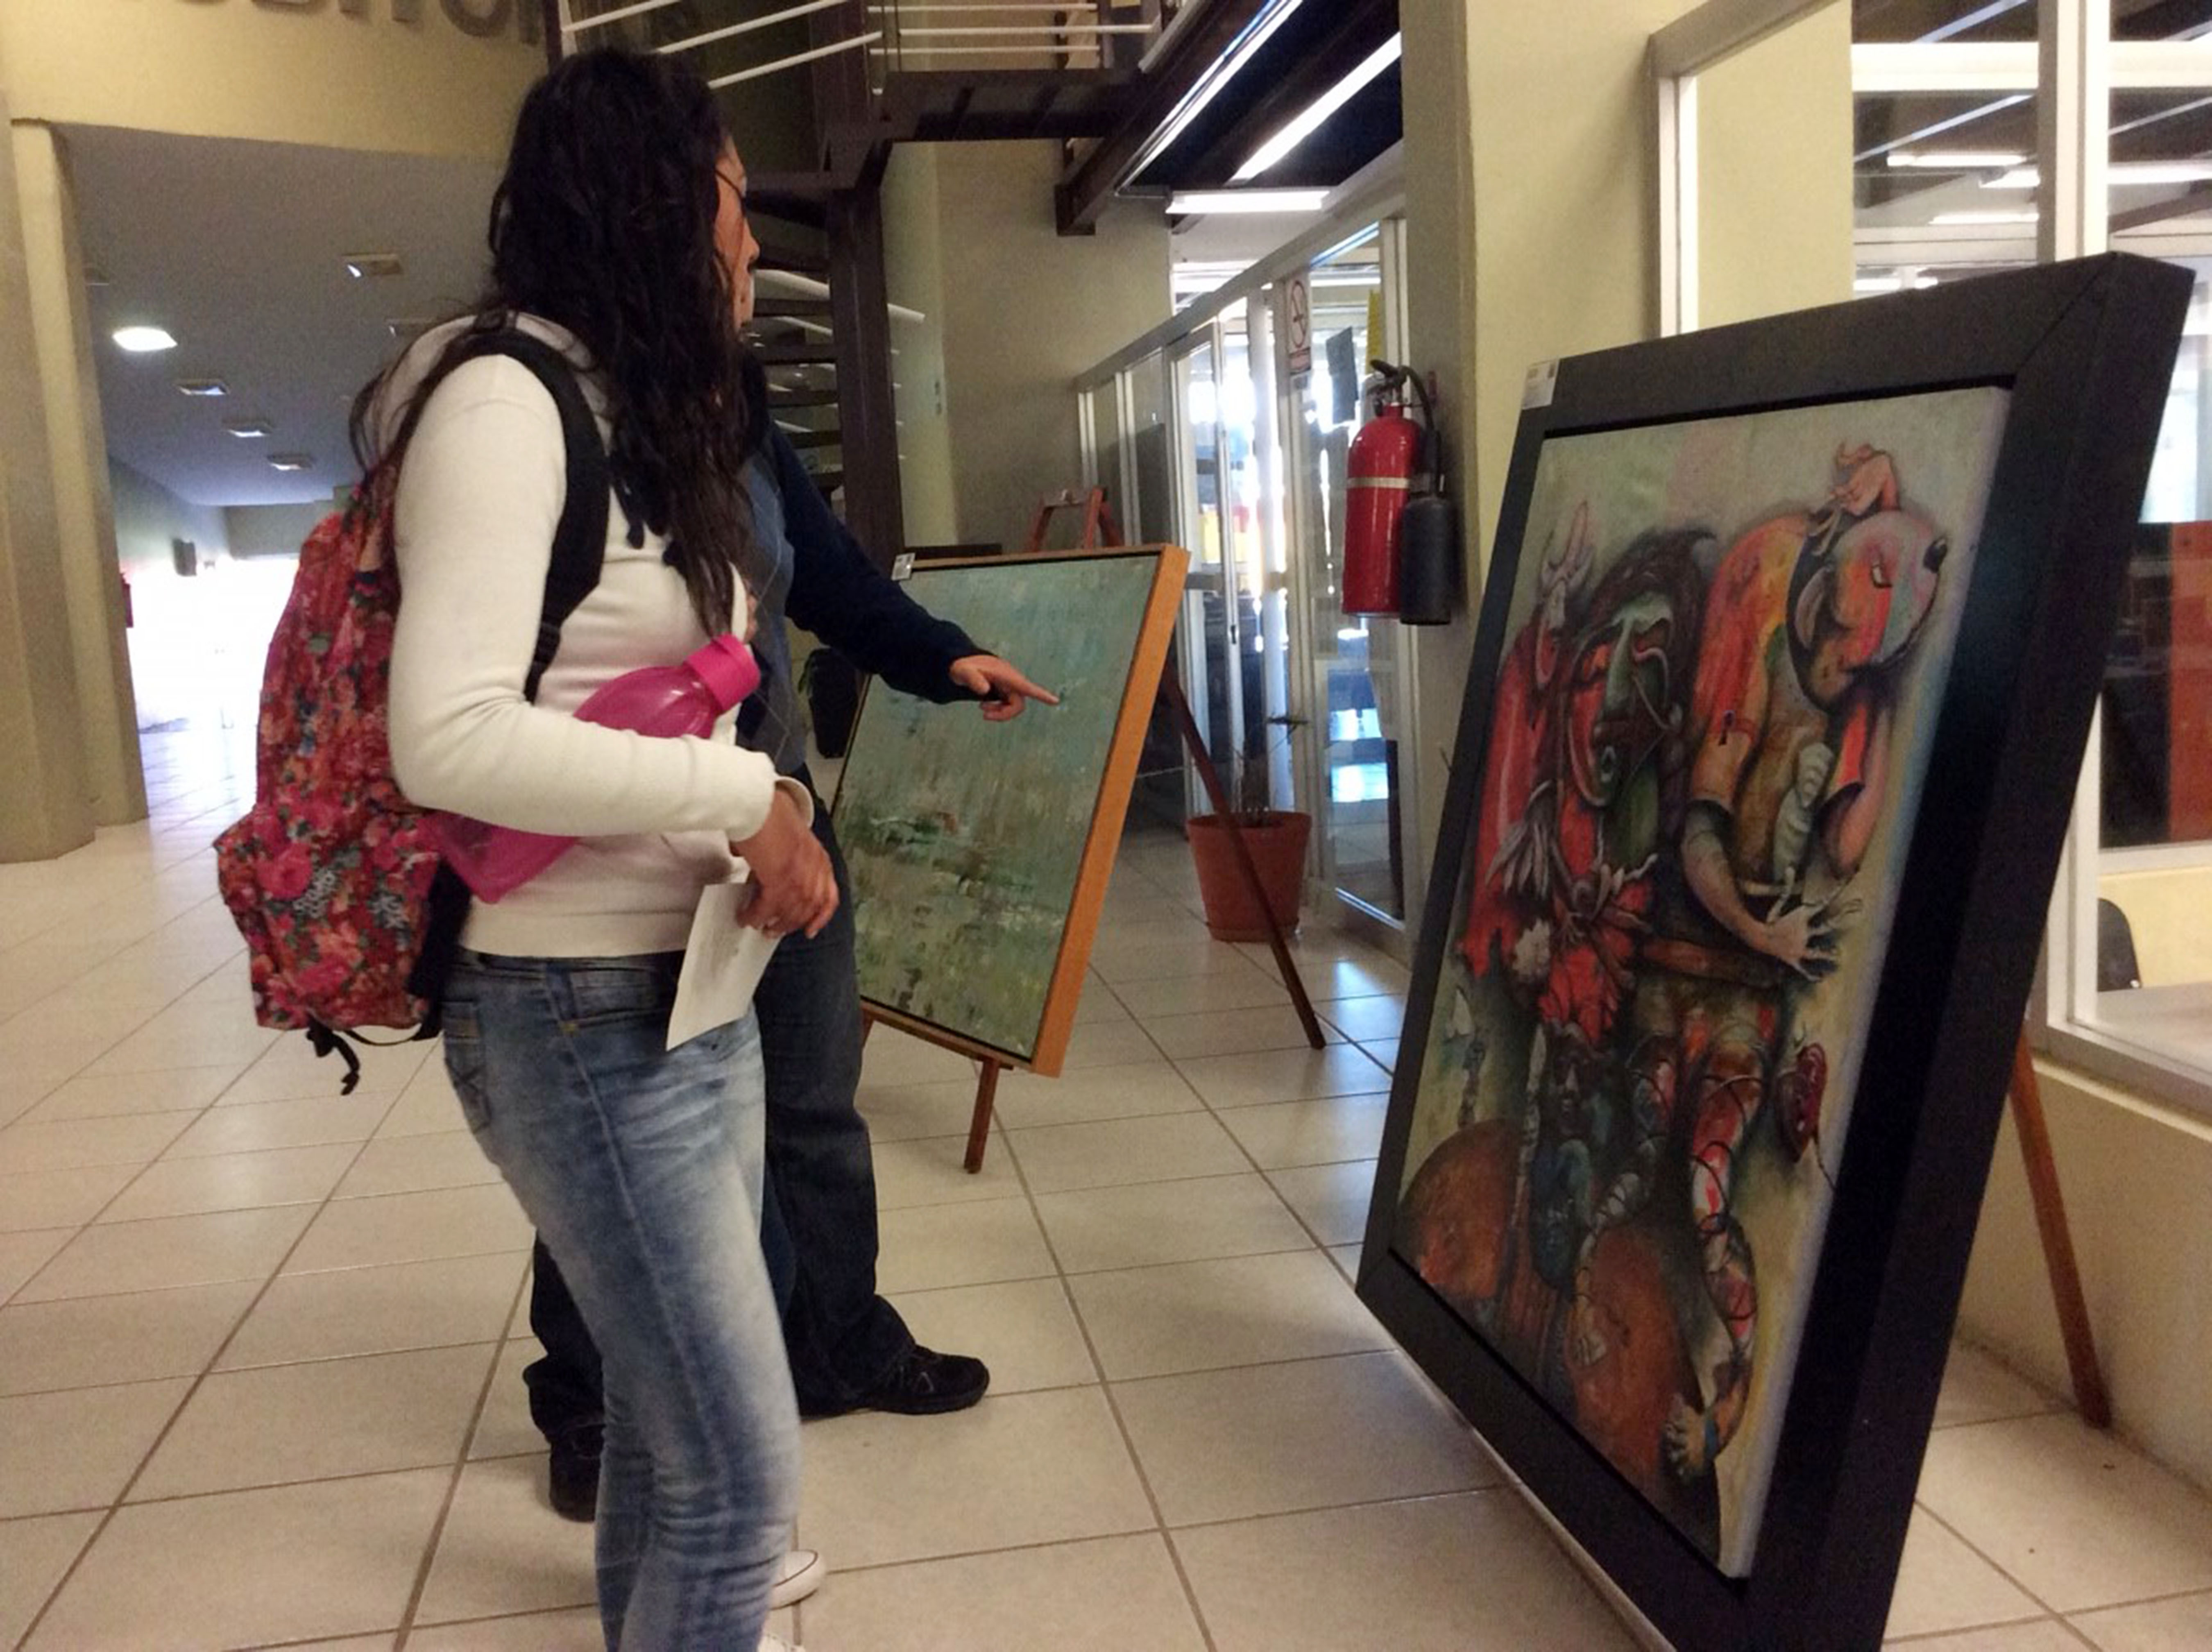 Jovenes admirando pintura abstracta